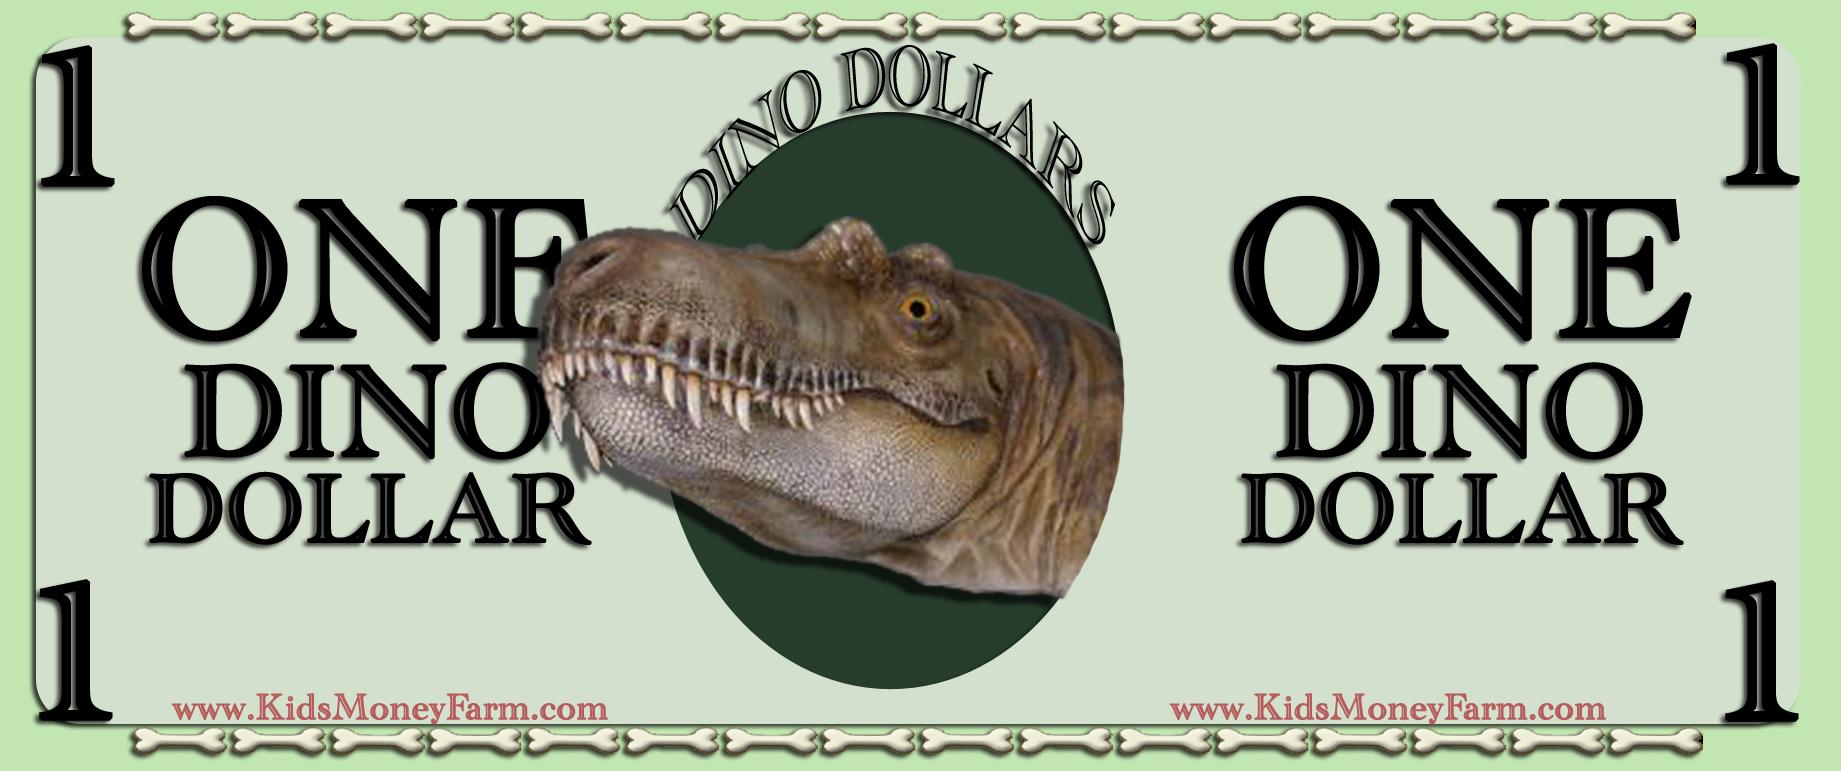 One Dino Dollar